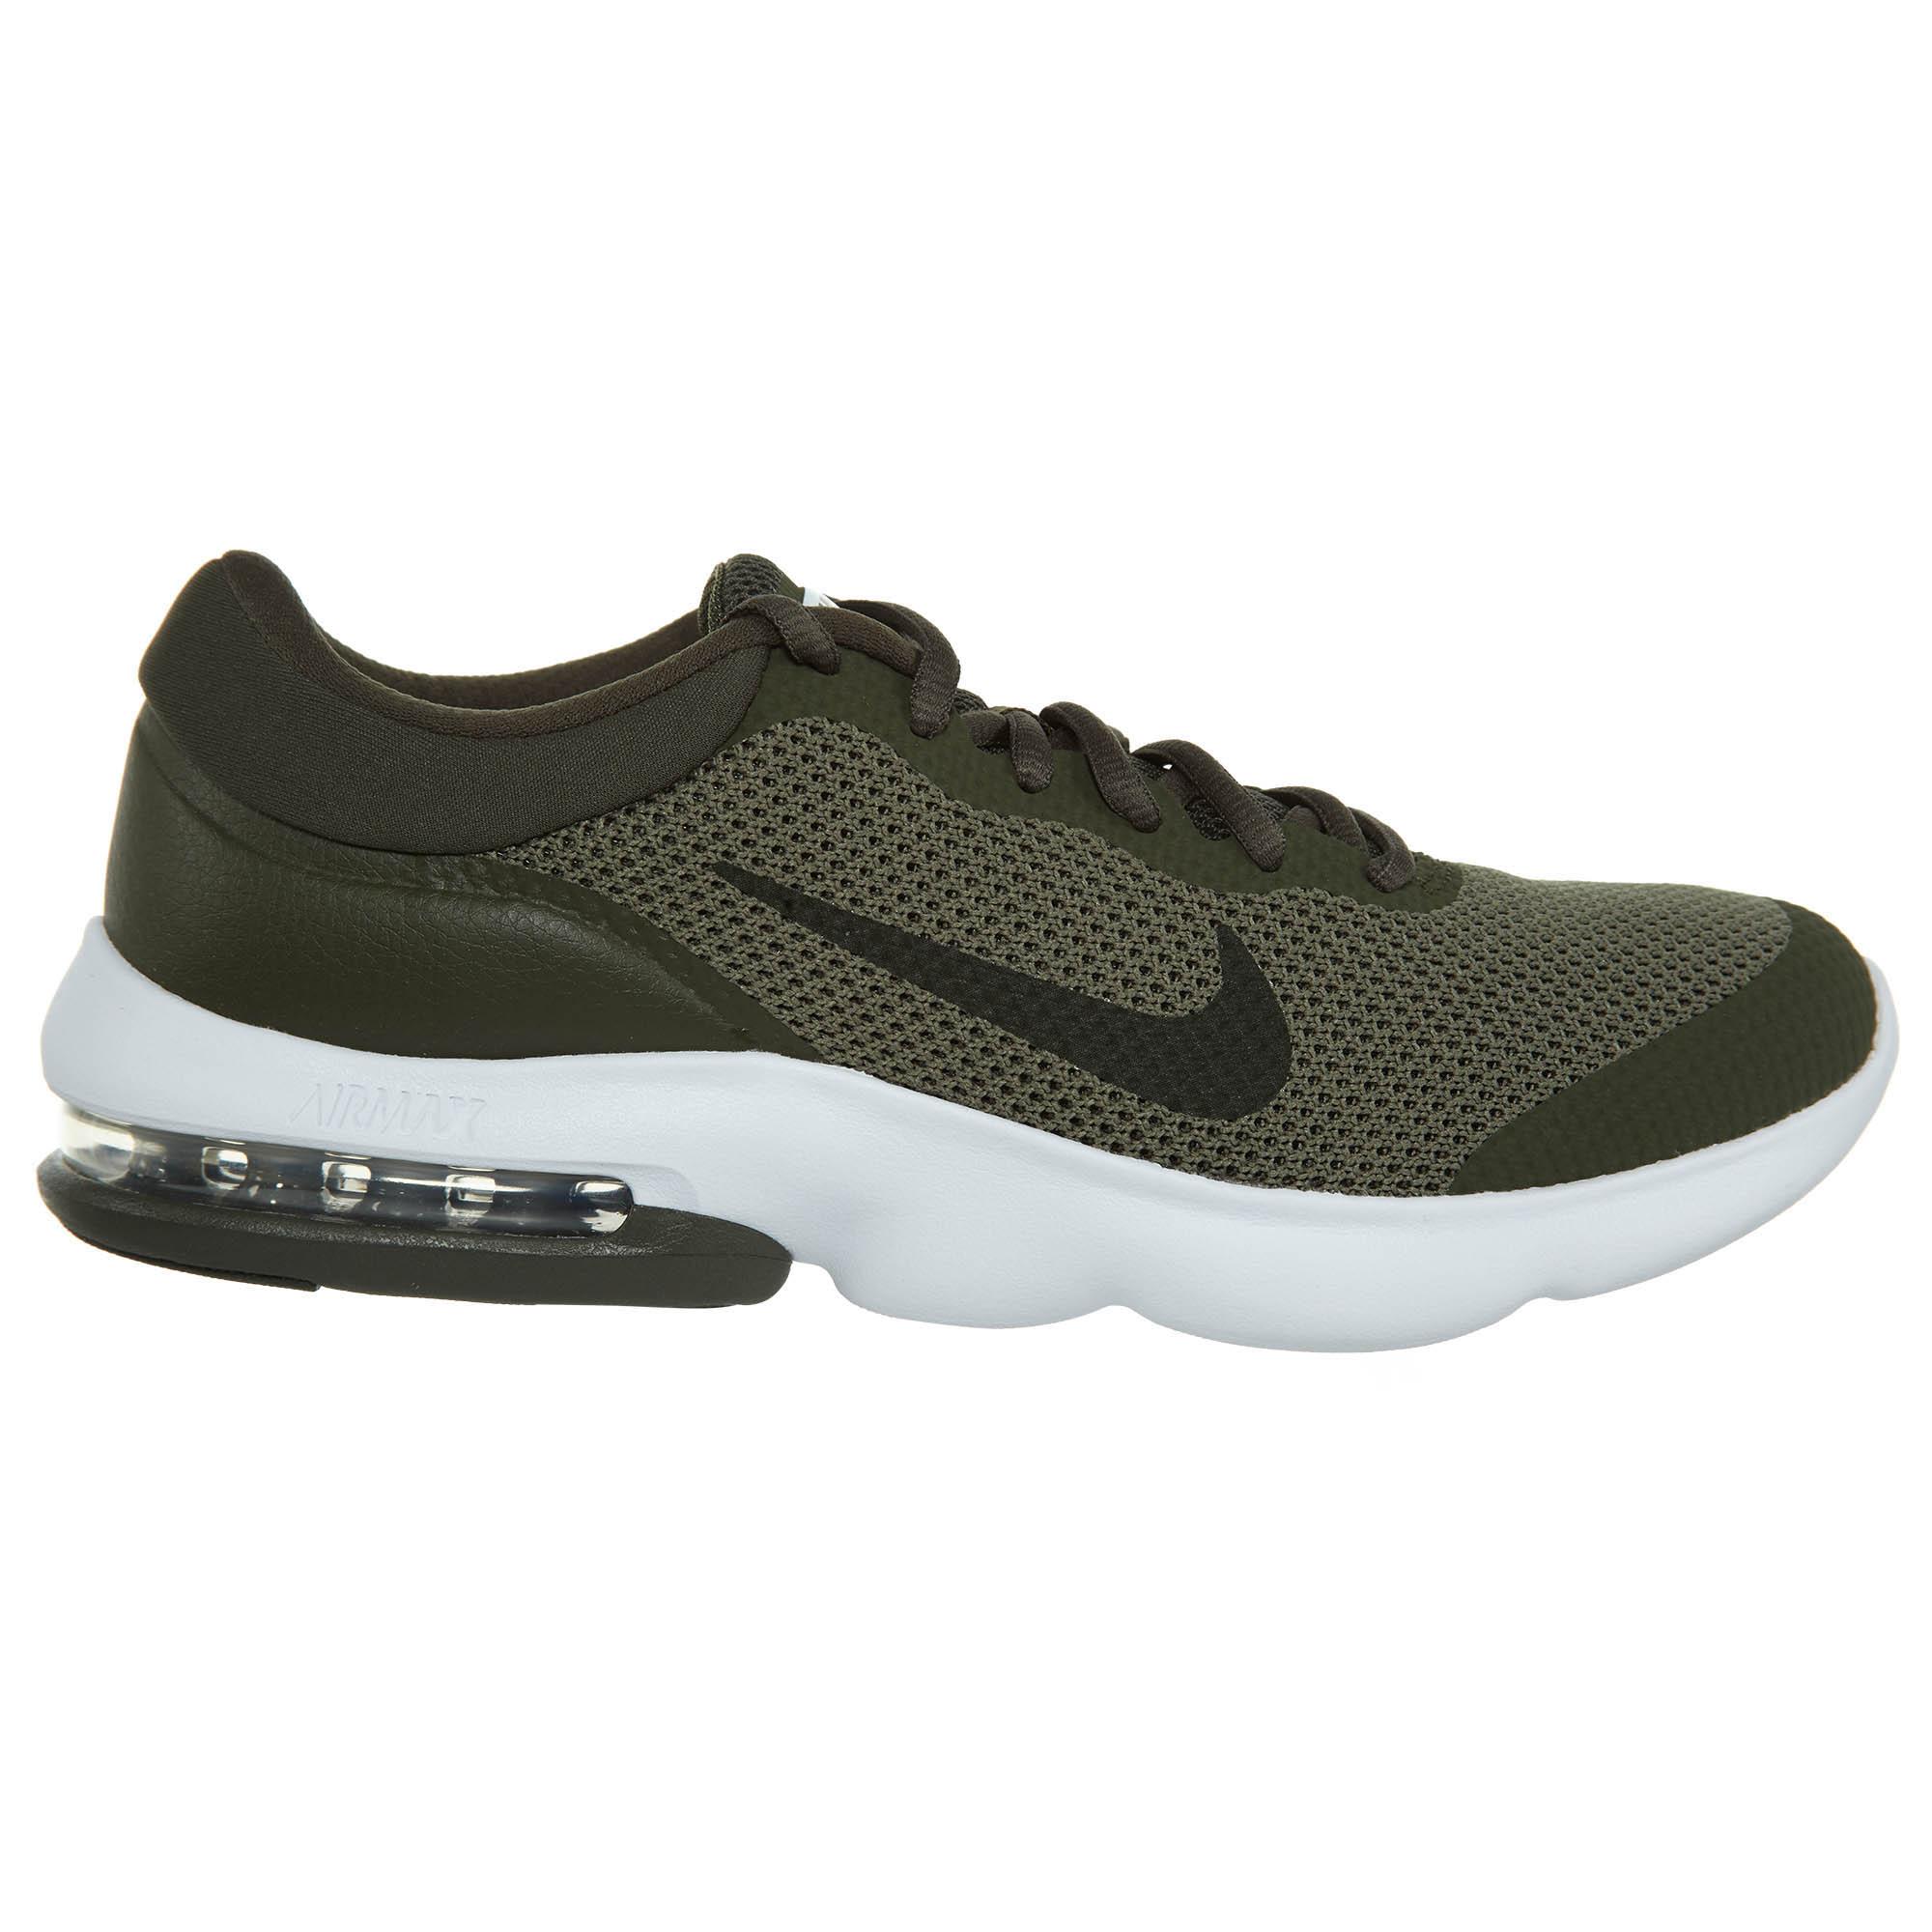 Nike Air Max Advantage Medium OliveSequoia 908981 200